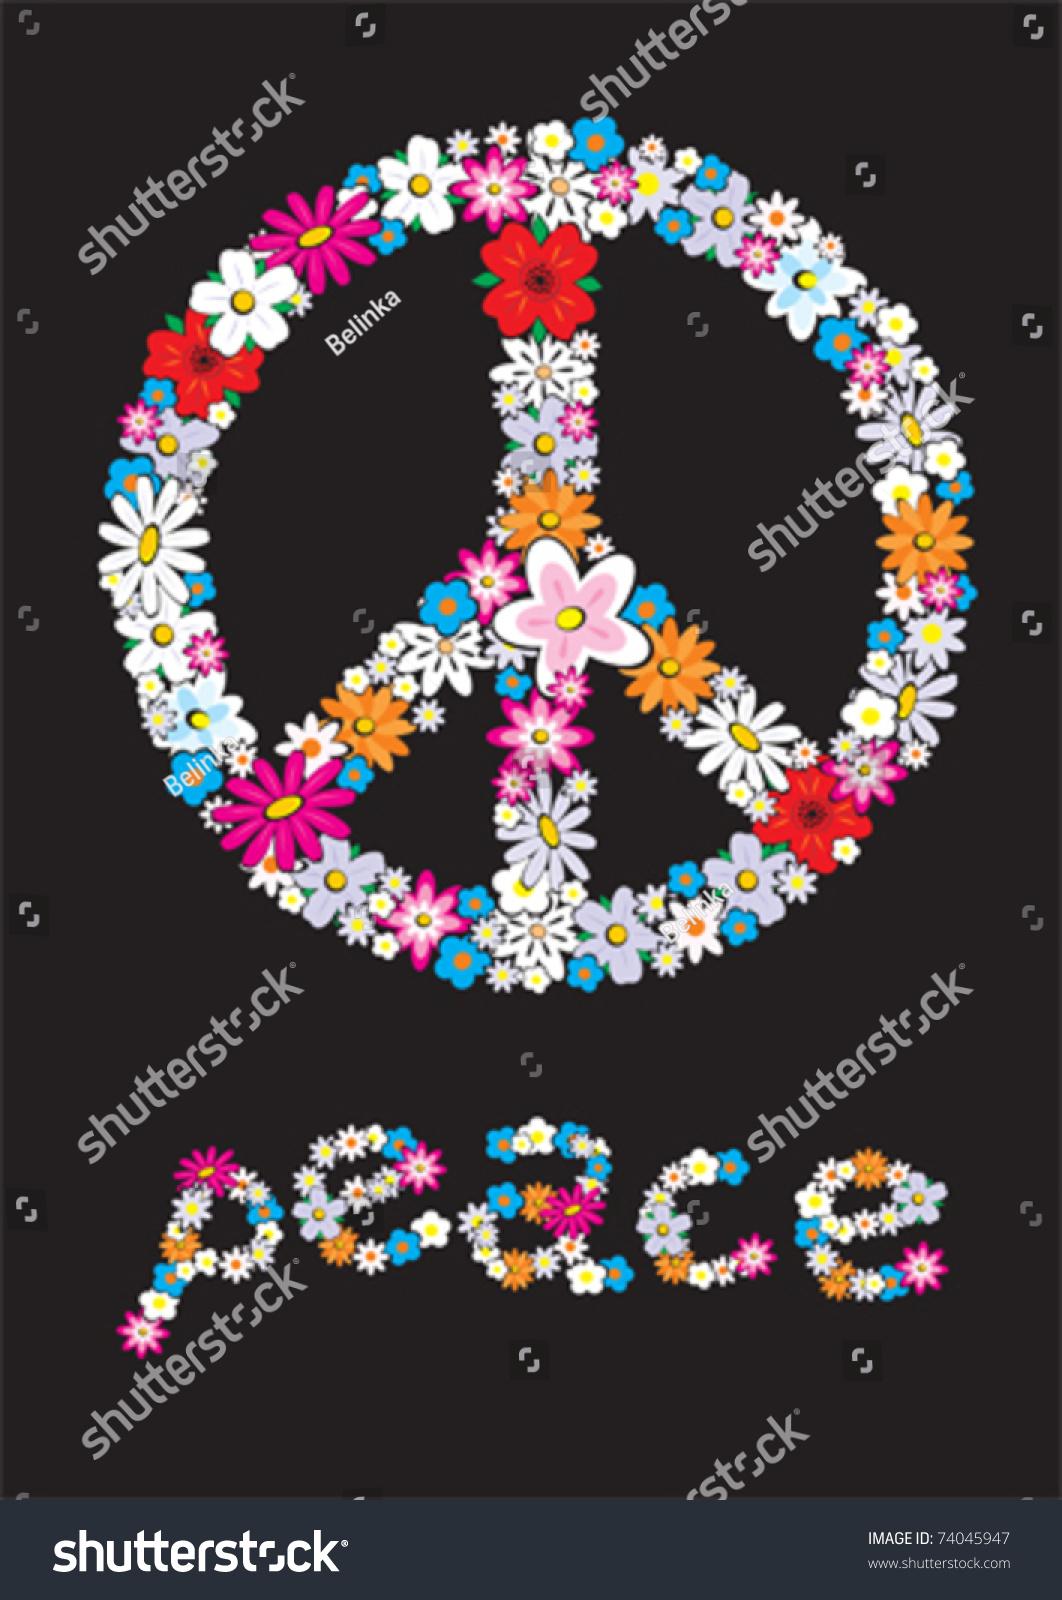 Vector Peace Flower Symbol Stock Vector 2018 74045947 Shutterstock